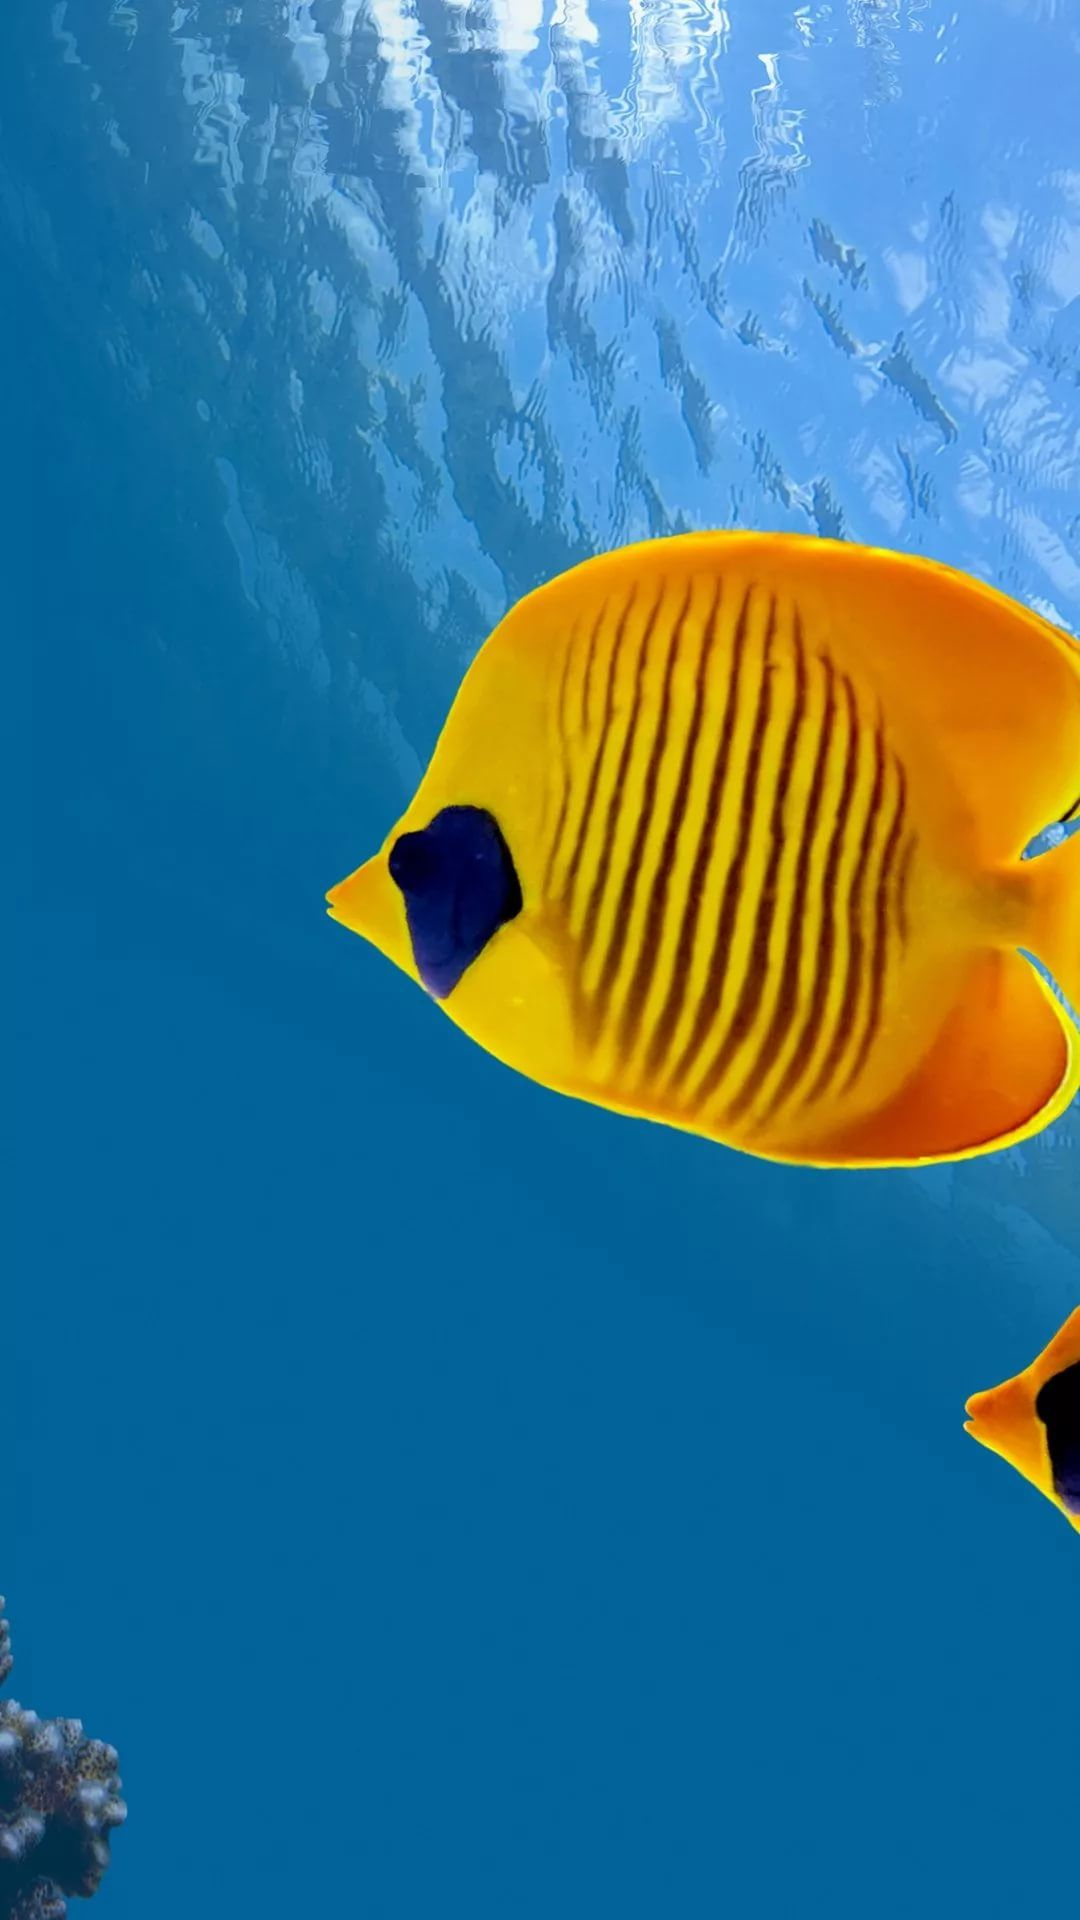 Fish iPhone 7 wallpaper hd